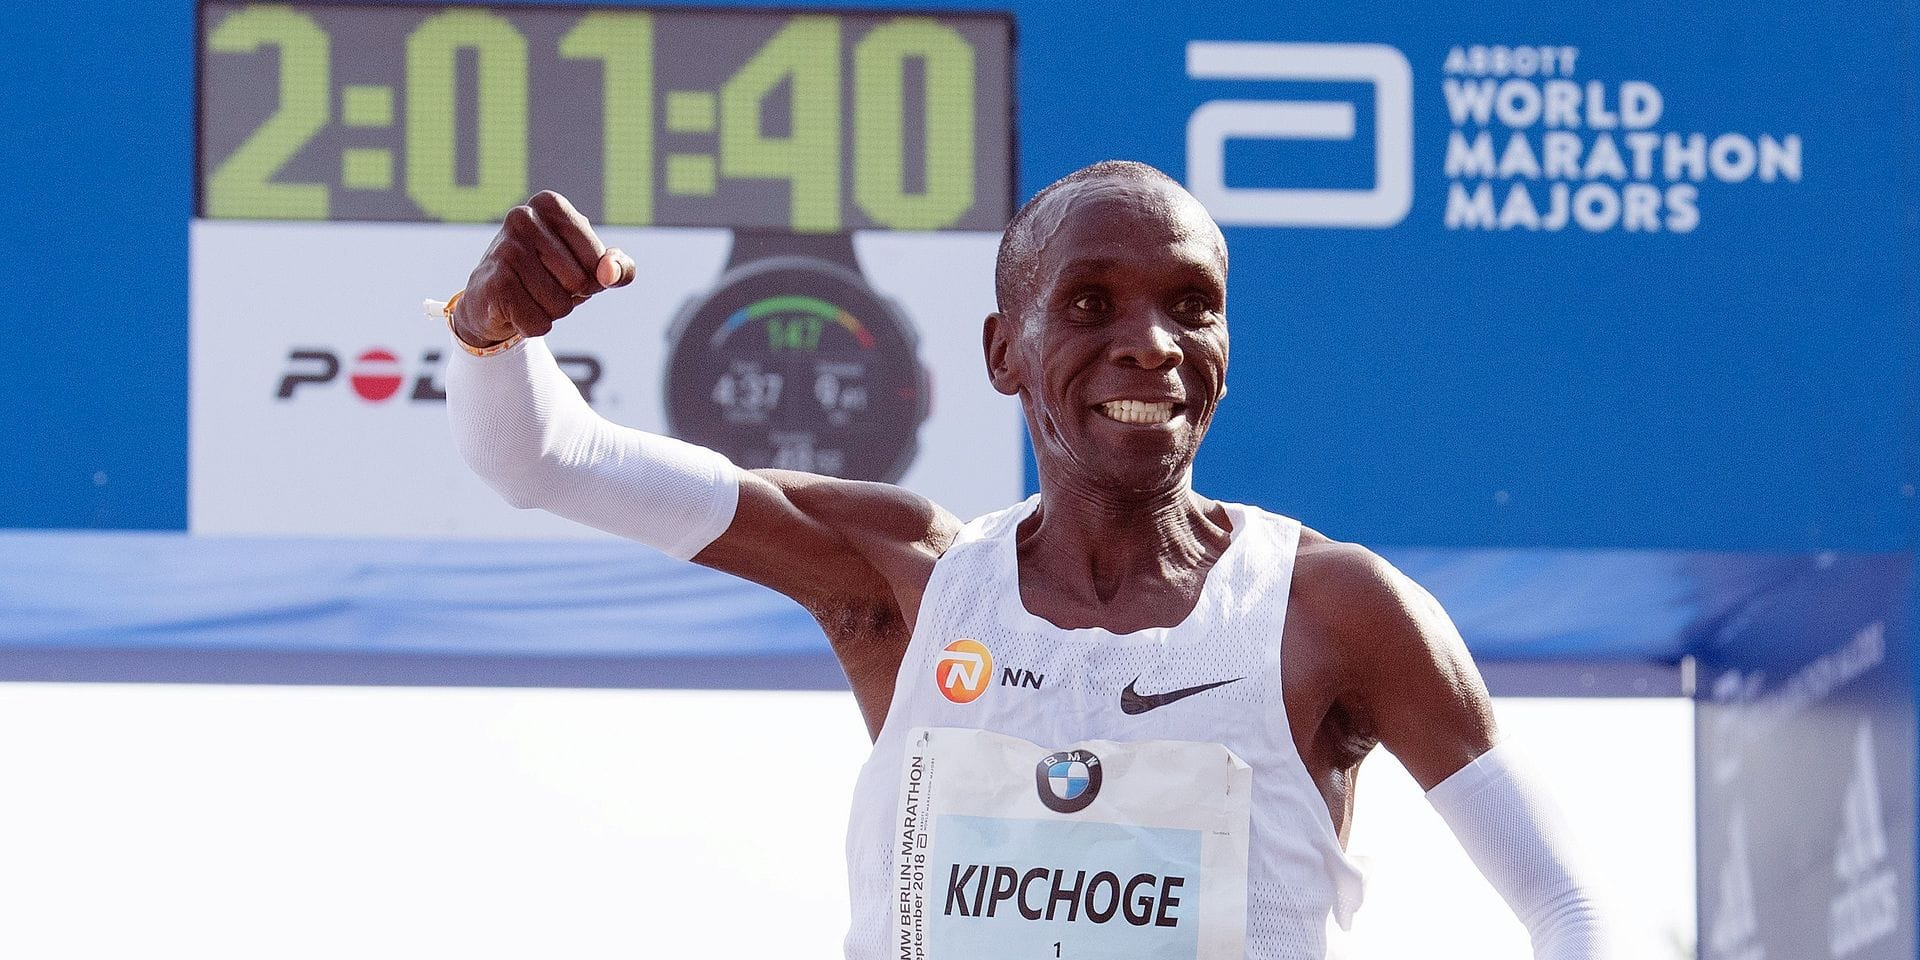 16 September 2018, Berlin: Eliud Kipchoge, Kenyan long-distance runner celebrates after wining the 45th BMW Berlin Marathon, in Berlin, Germany, 16 September 2018. Photo: Soeren Stache/dpa